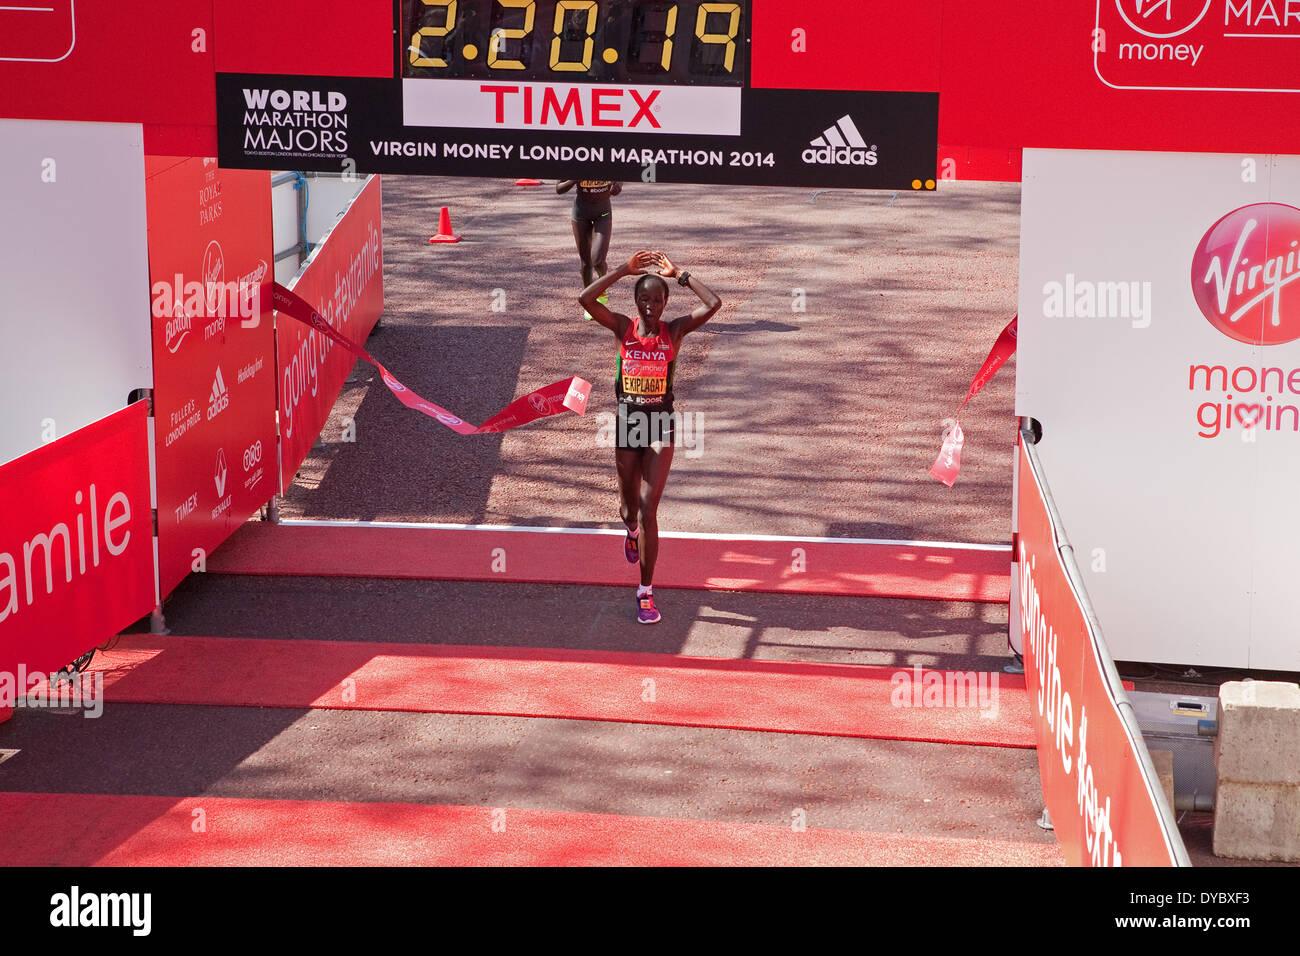 London,UK,13th April 2014,Edna Kiplagat was the winner of the London Marathon 201 Credit: Keith Larby/Alamy Live News - Stock Image